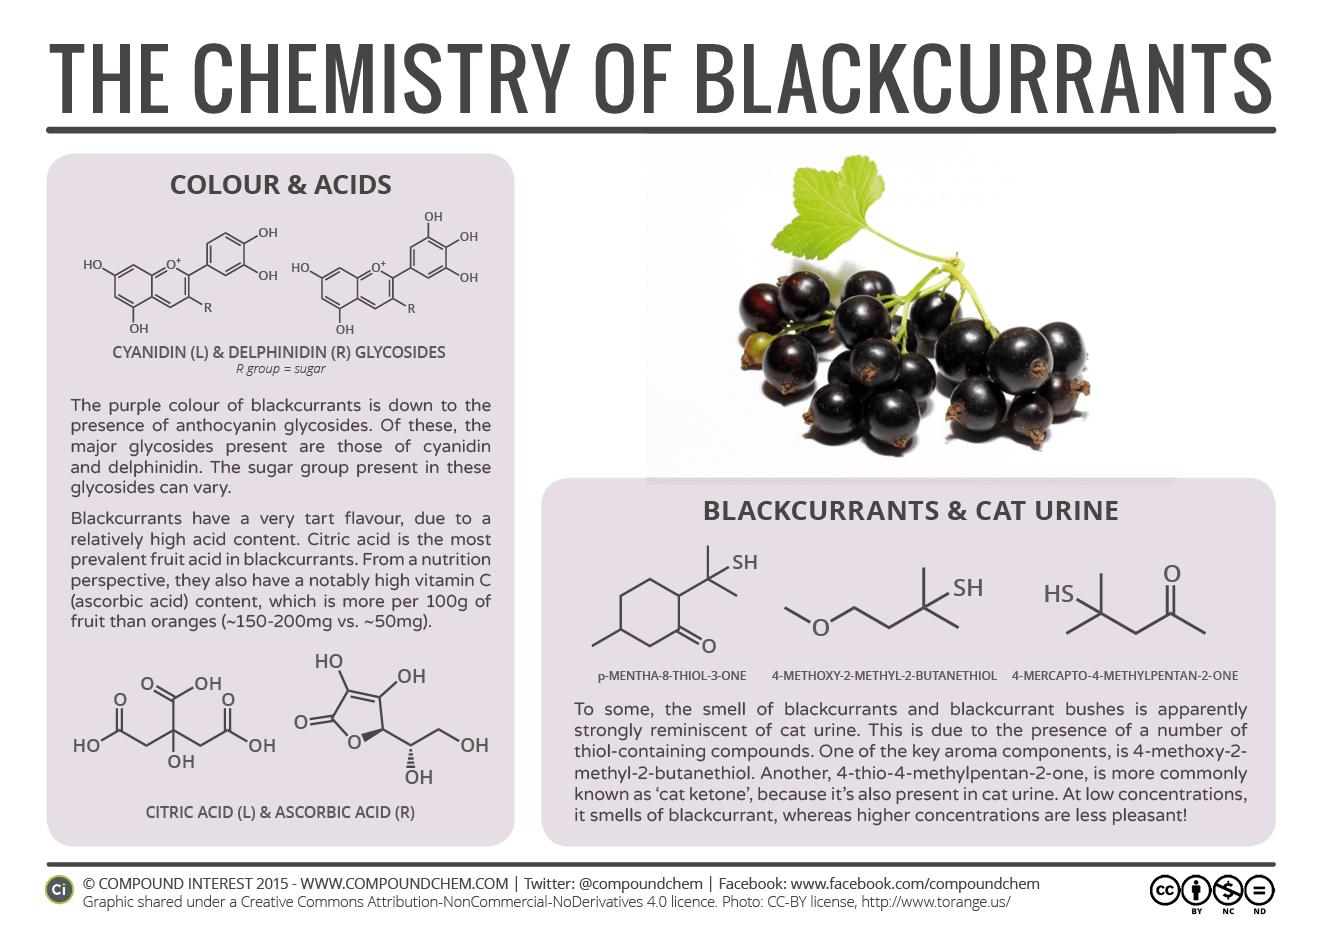 Blackcurrants & Cat Urine – The Chemistry of Blackcurrants